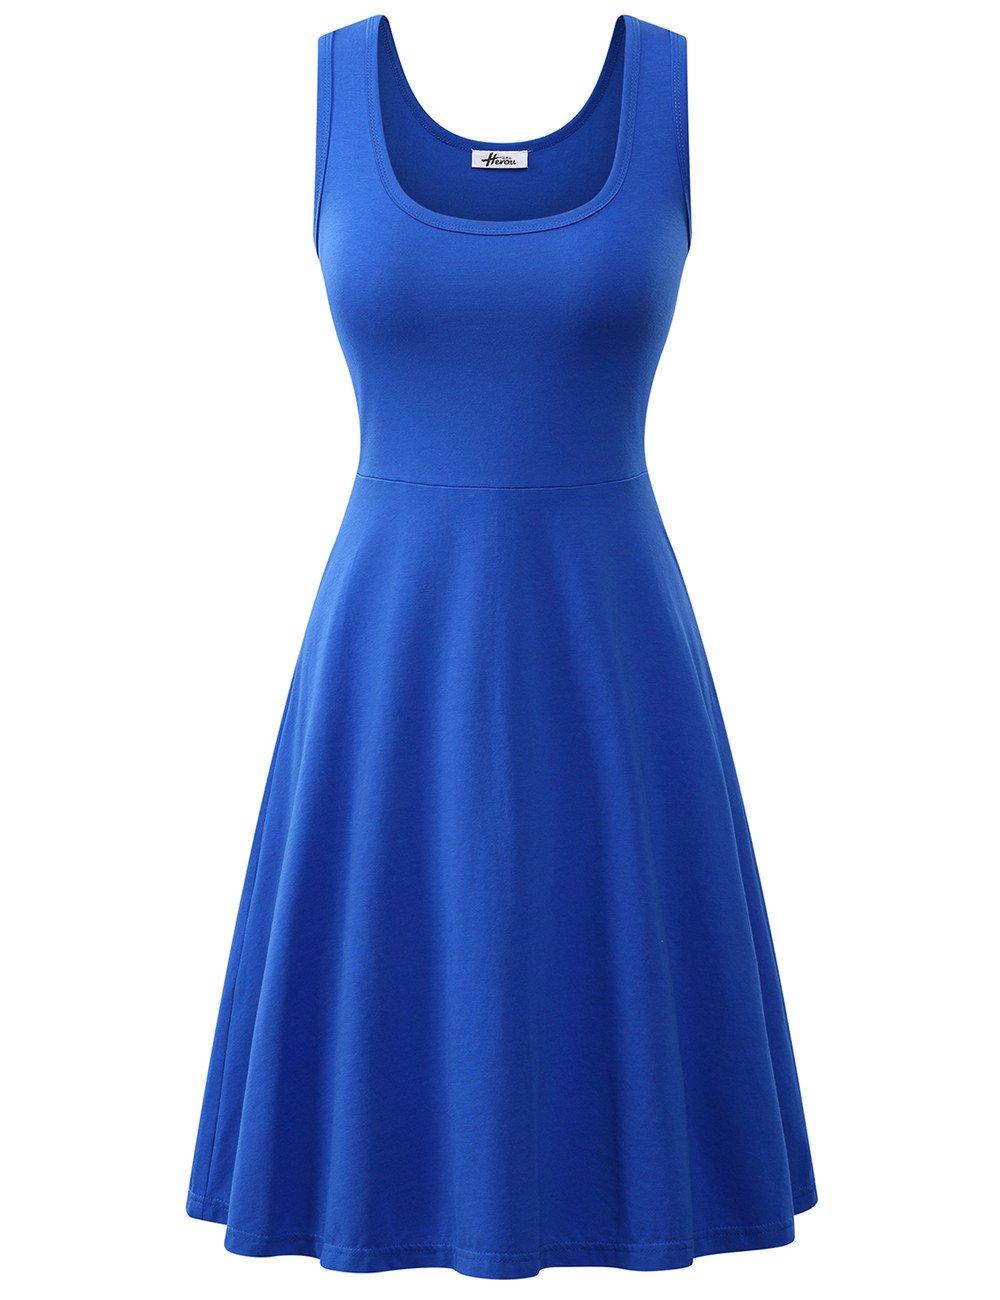 Herou Women Summer Beach Cotton Tank Dress(Large,Royal Blue)